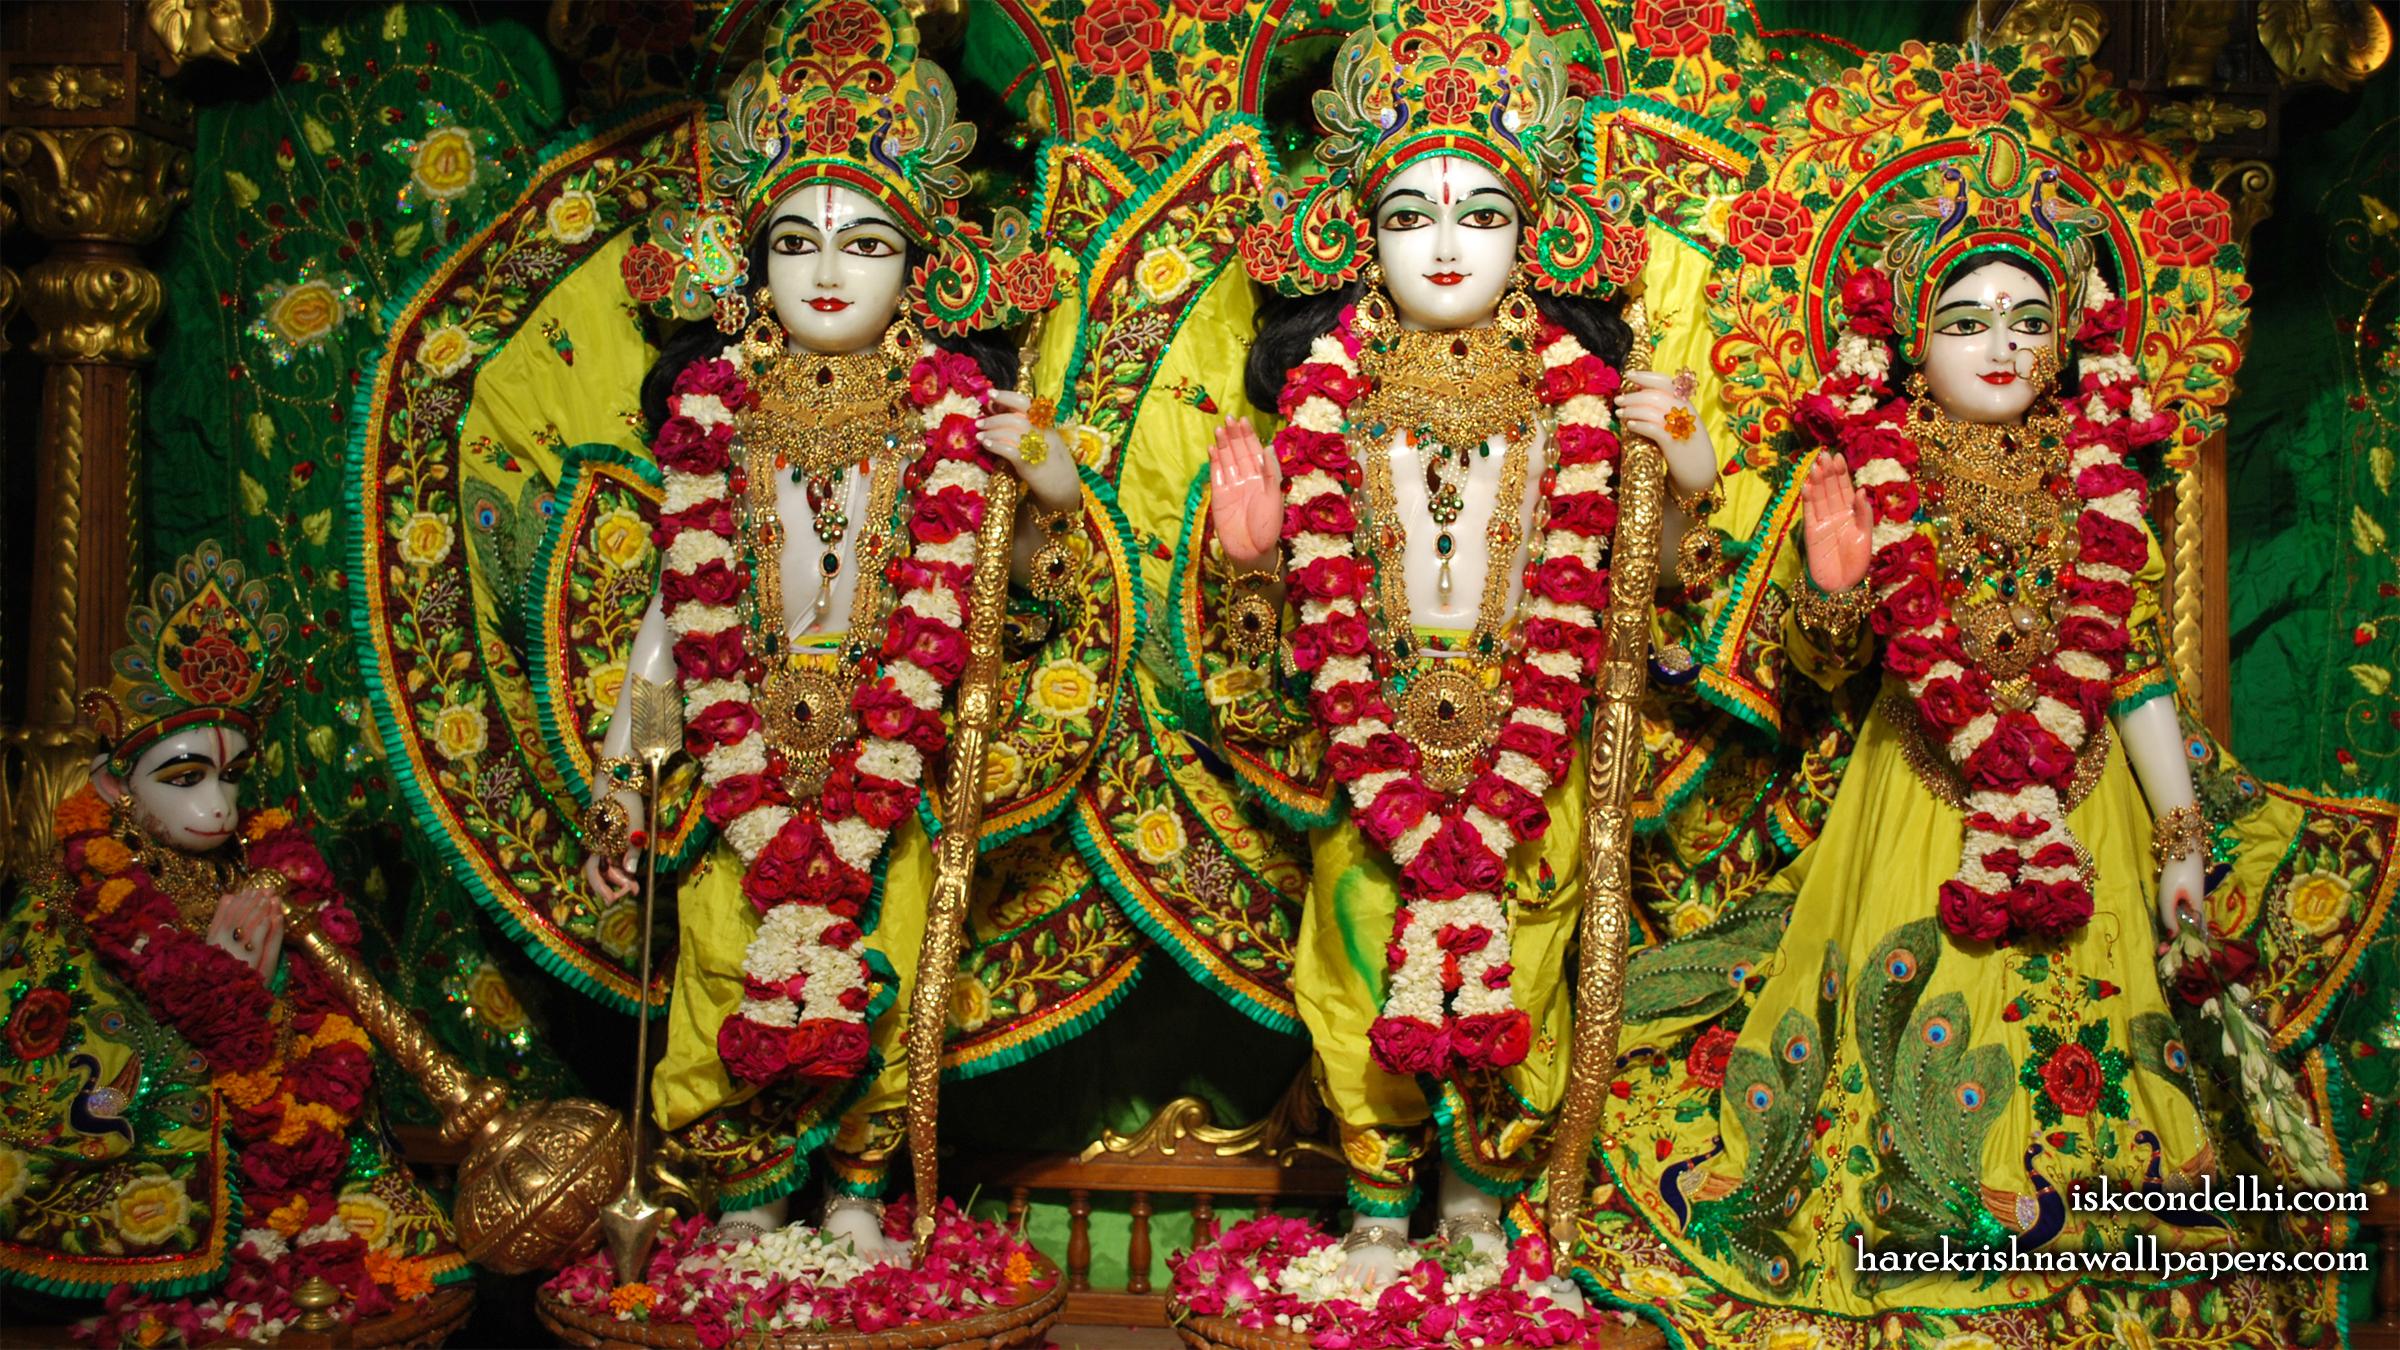 Sri Sri Sita Rama Laxman Hanuman Wallpaper (012) Size 2400x1350 Download